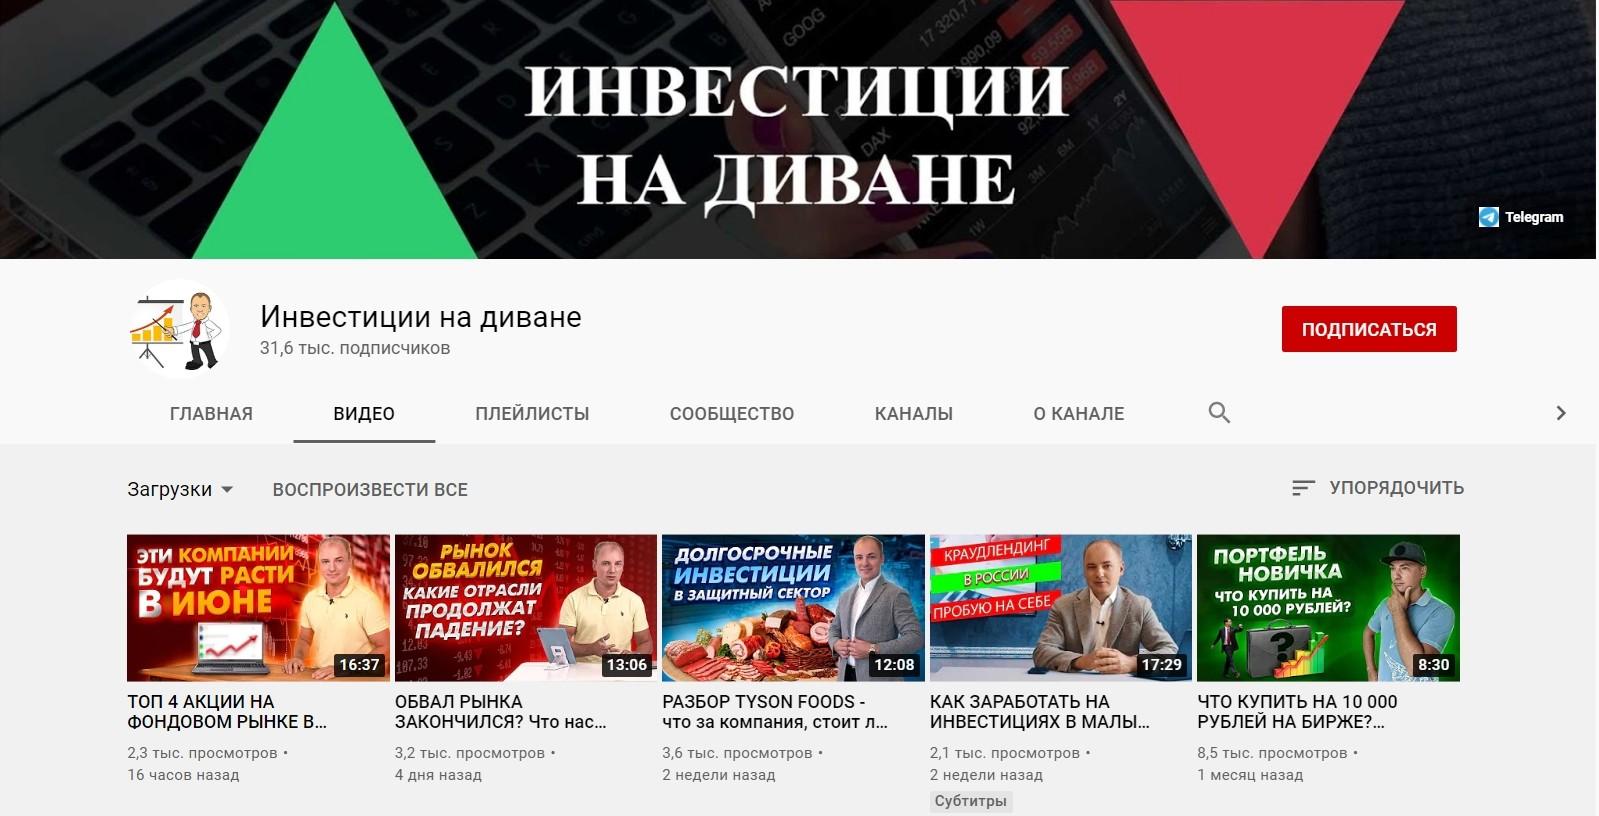 Ютуб канал Алексея Чечукевича